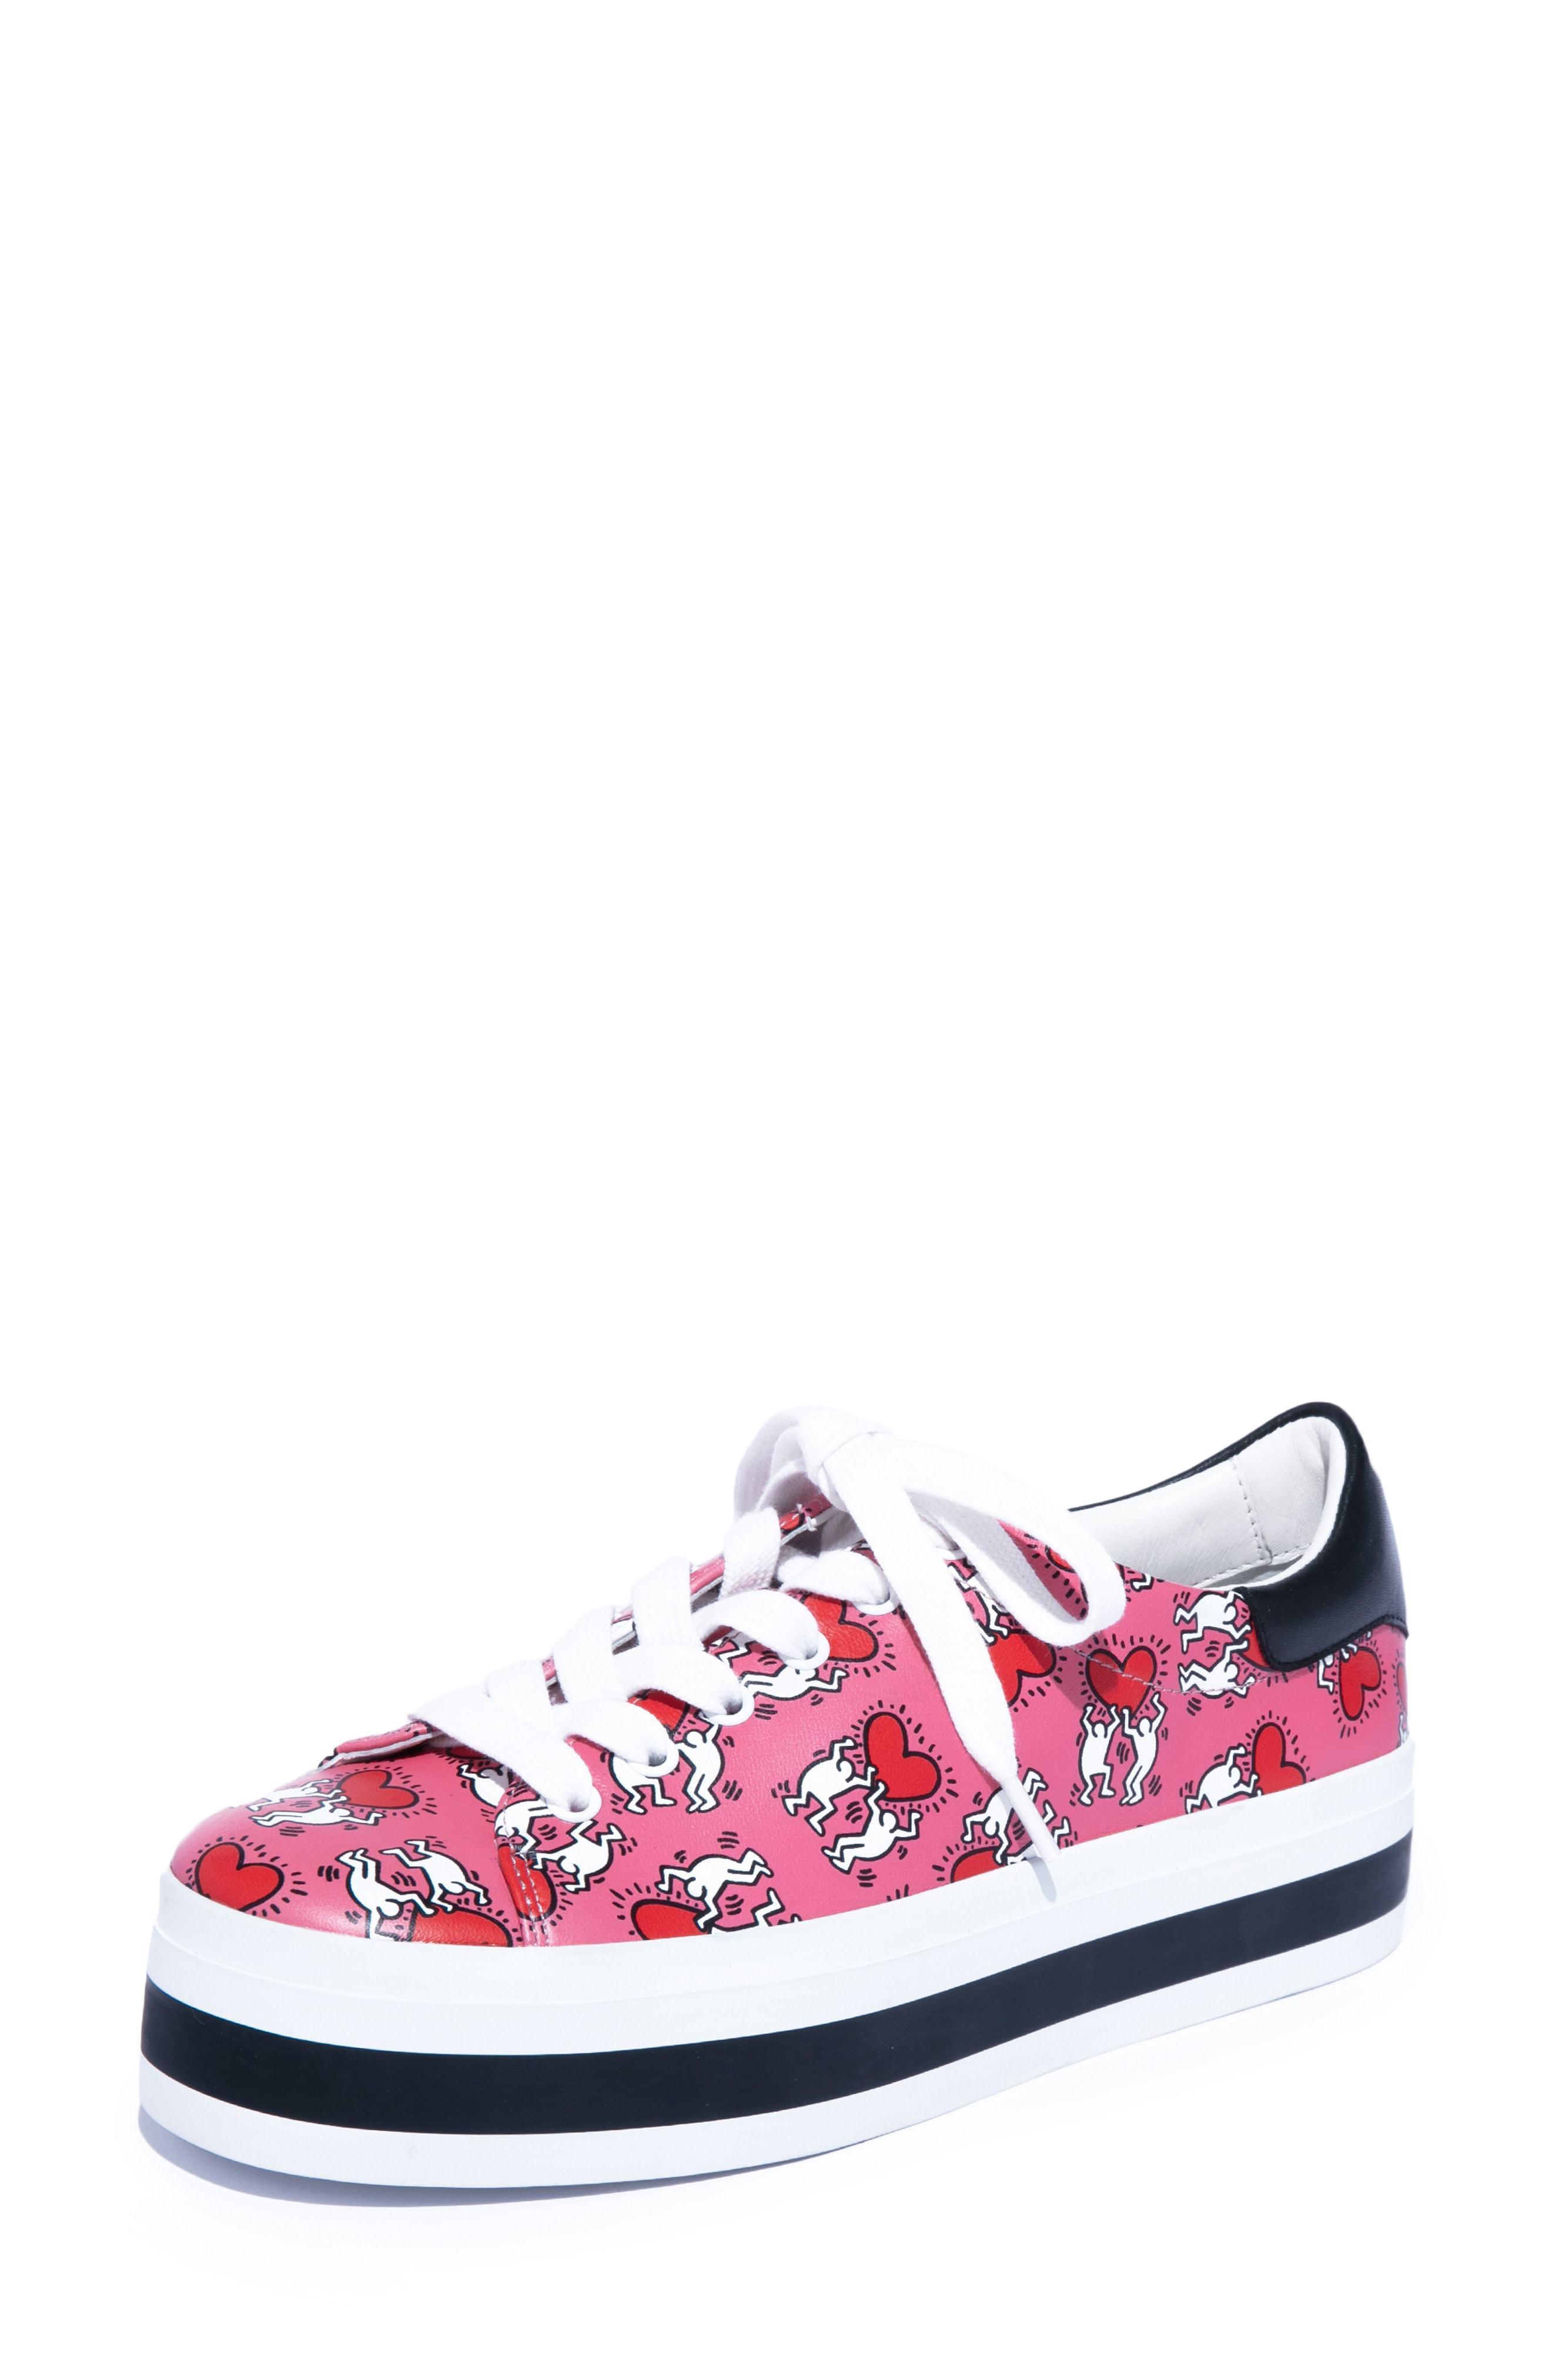 c2000d8a4438 ... Alice + Olivia X Keith Haring Ezra Flatform Sneaker